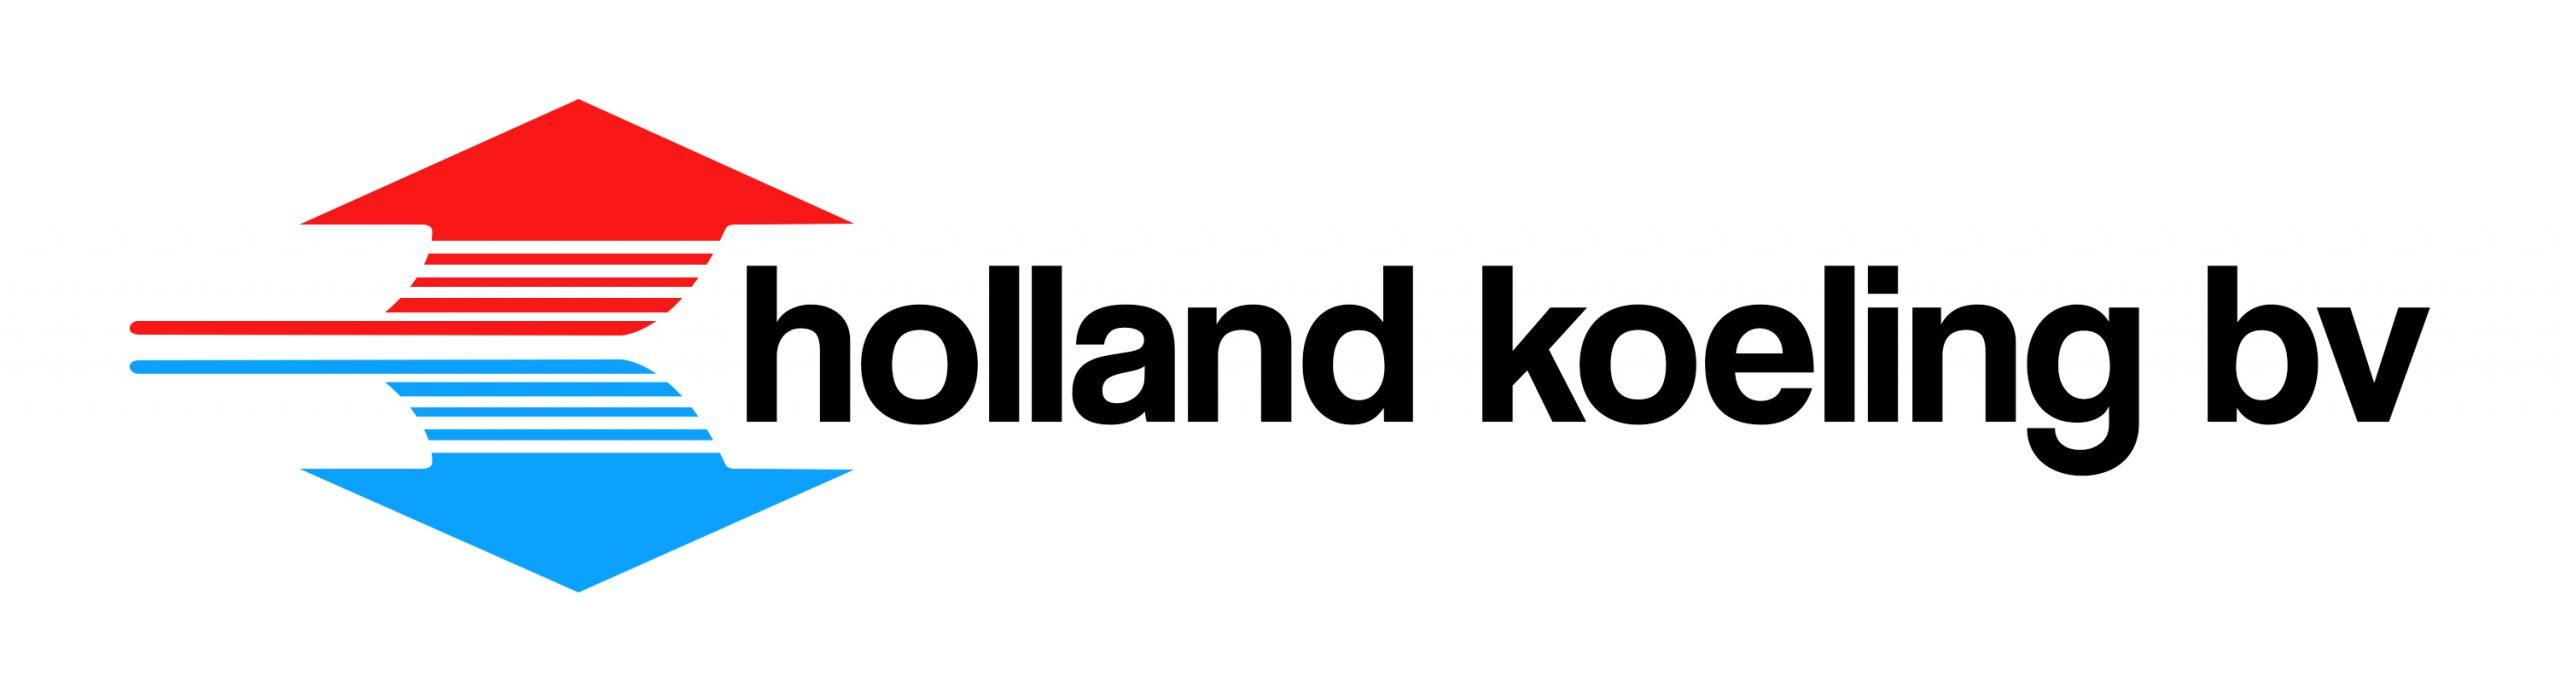 Holland Koeling